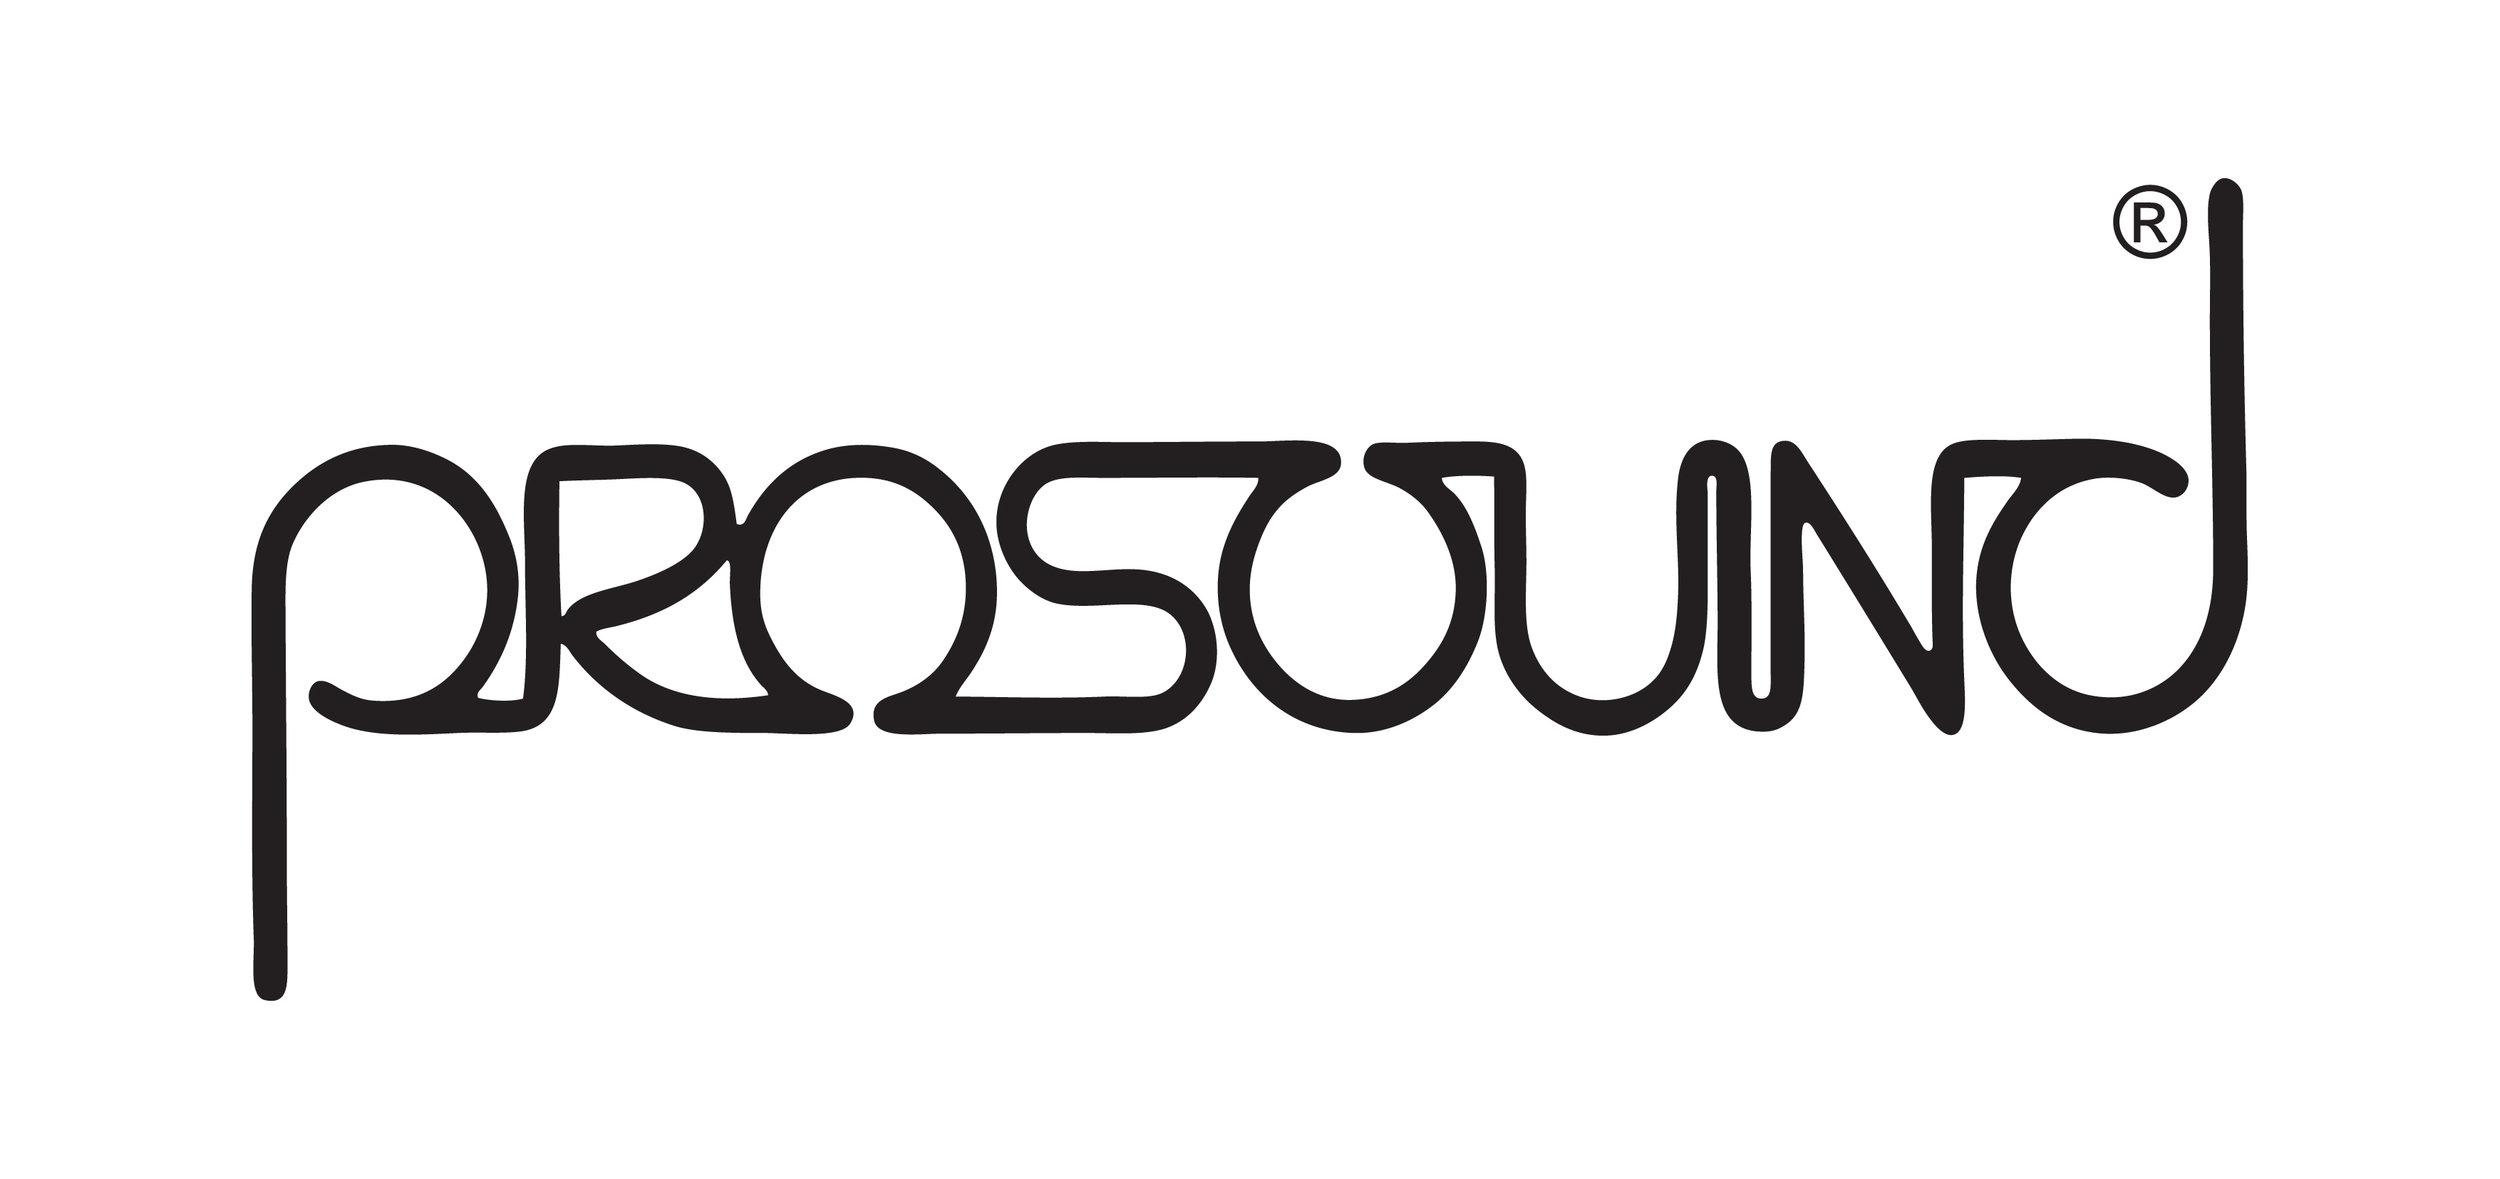 Prosound_logo_black_highres.jpg